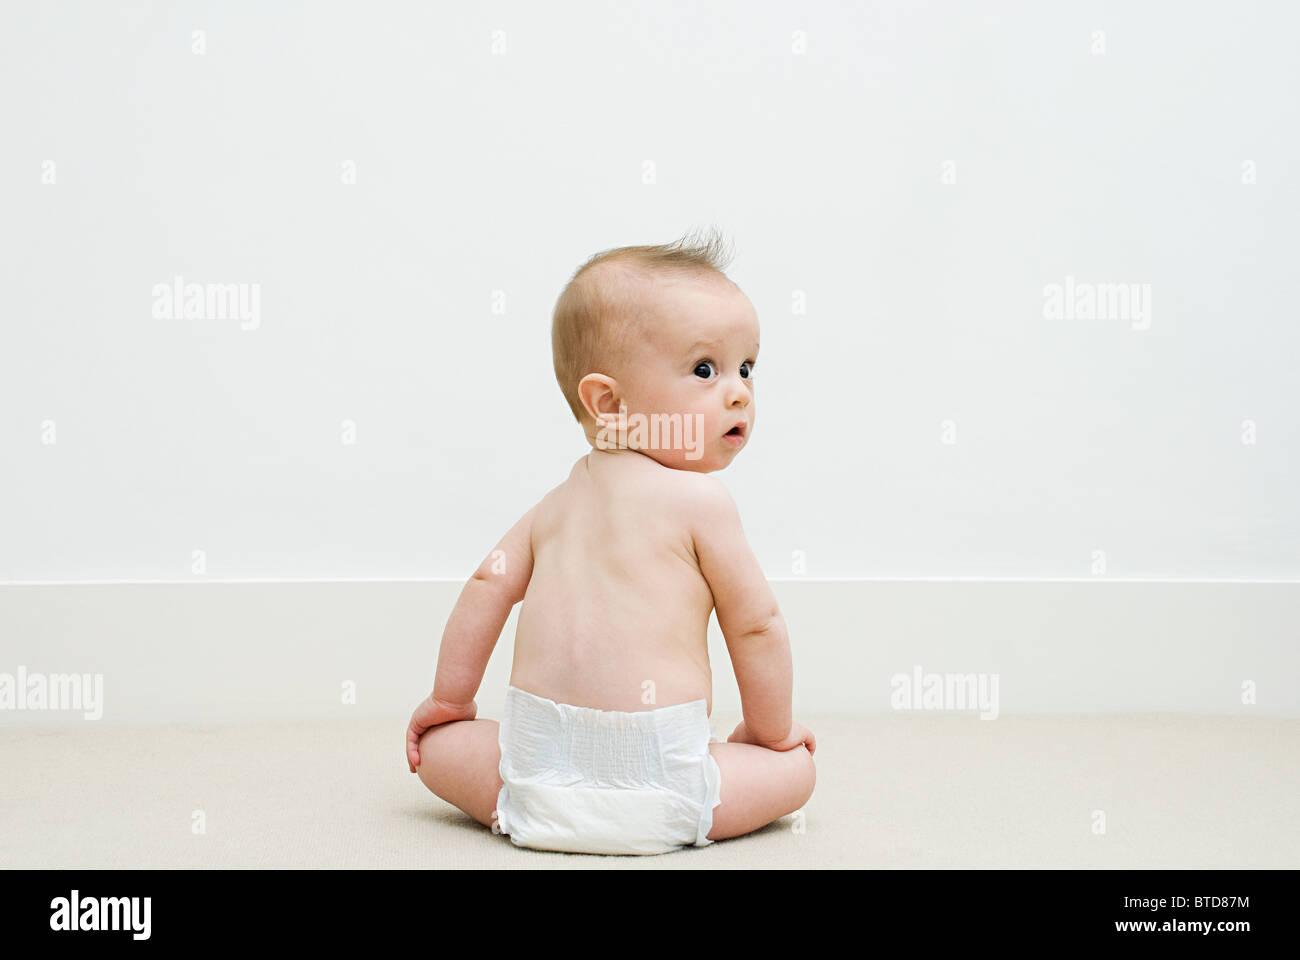 Baby - Stock Image